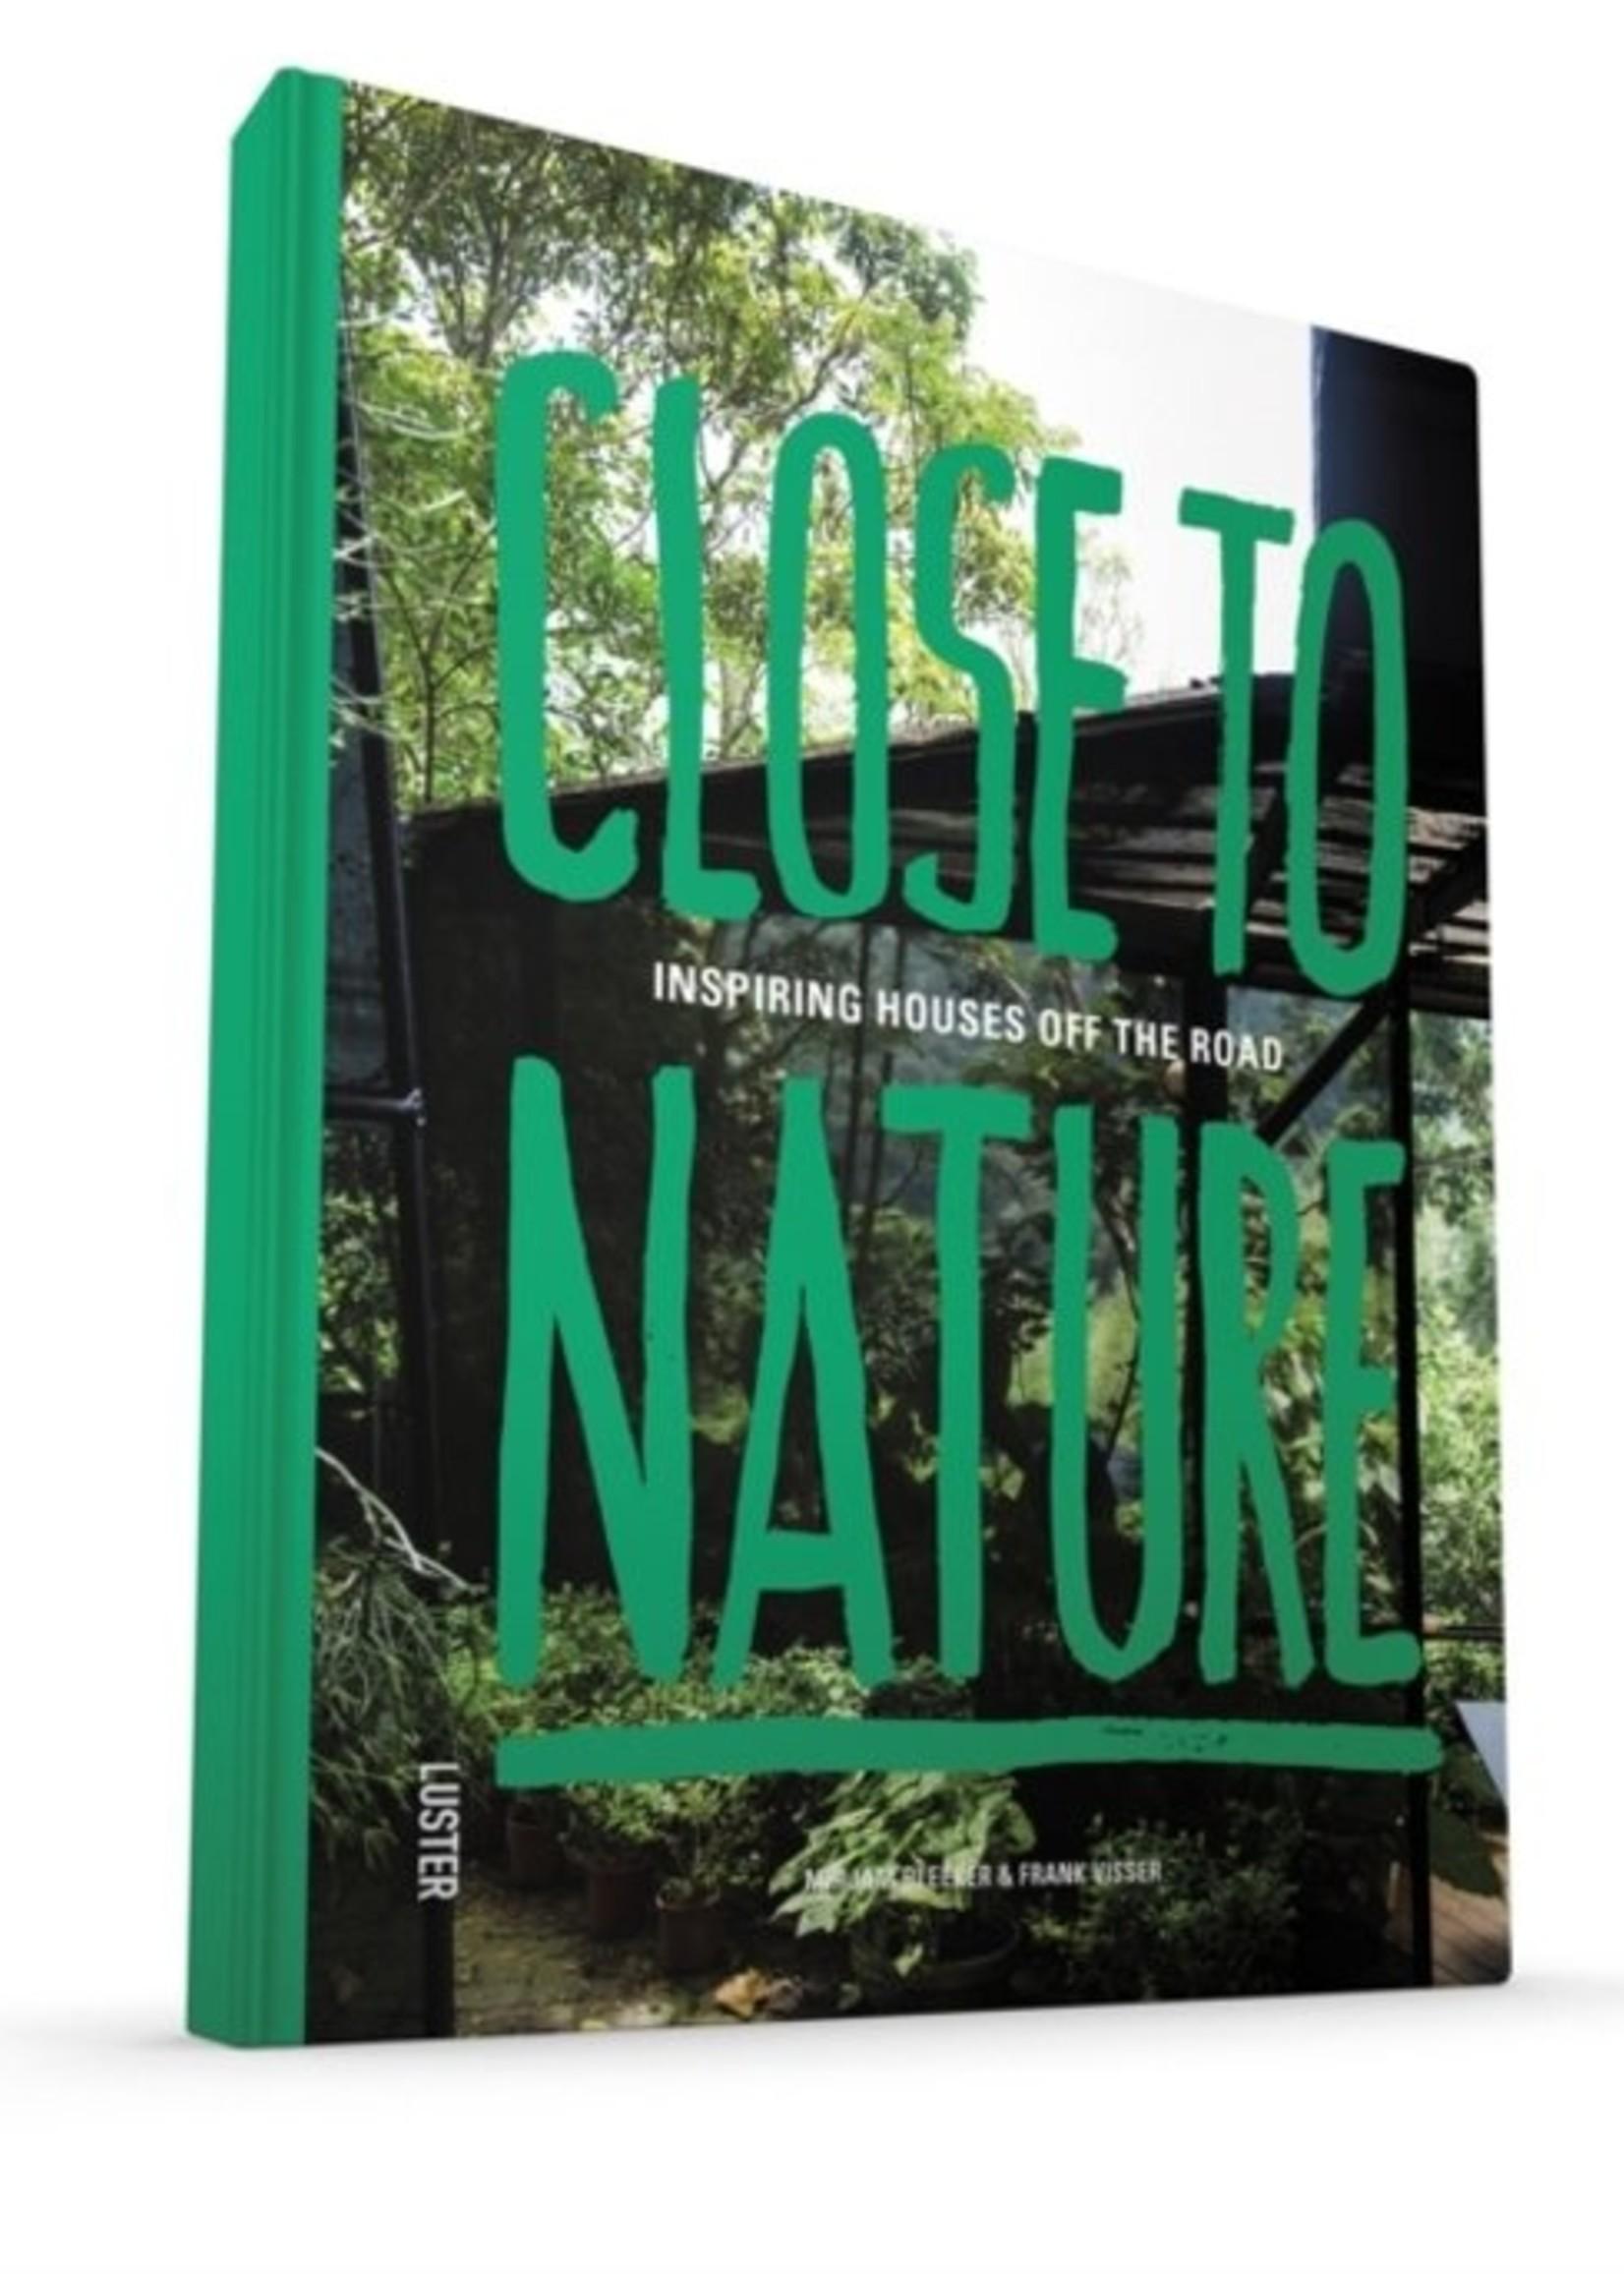 Book Close to nature